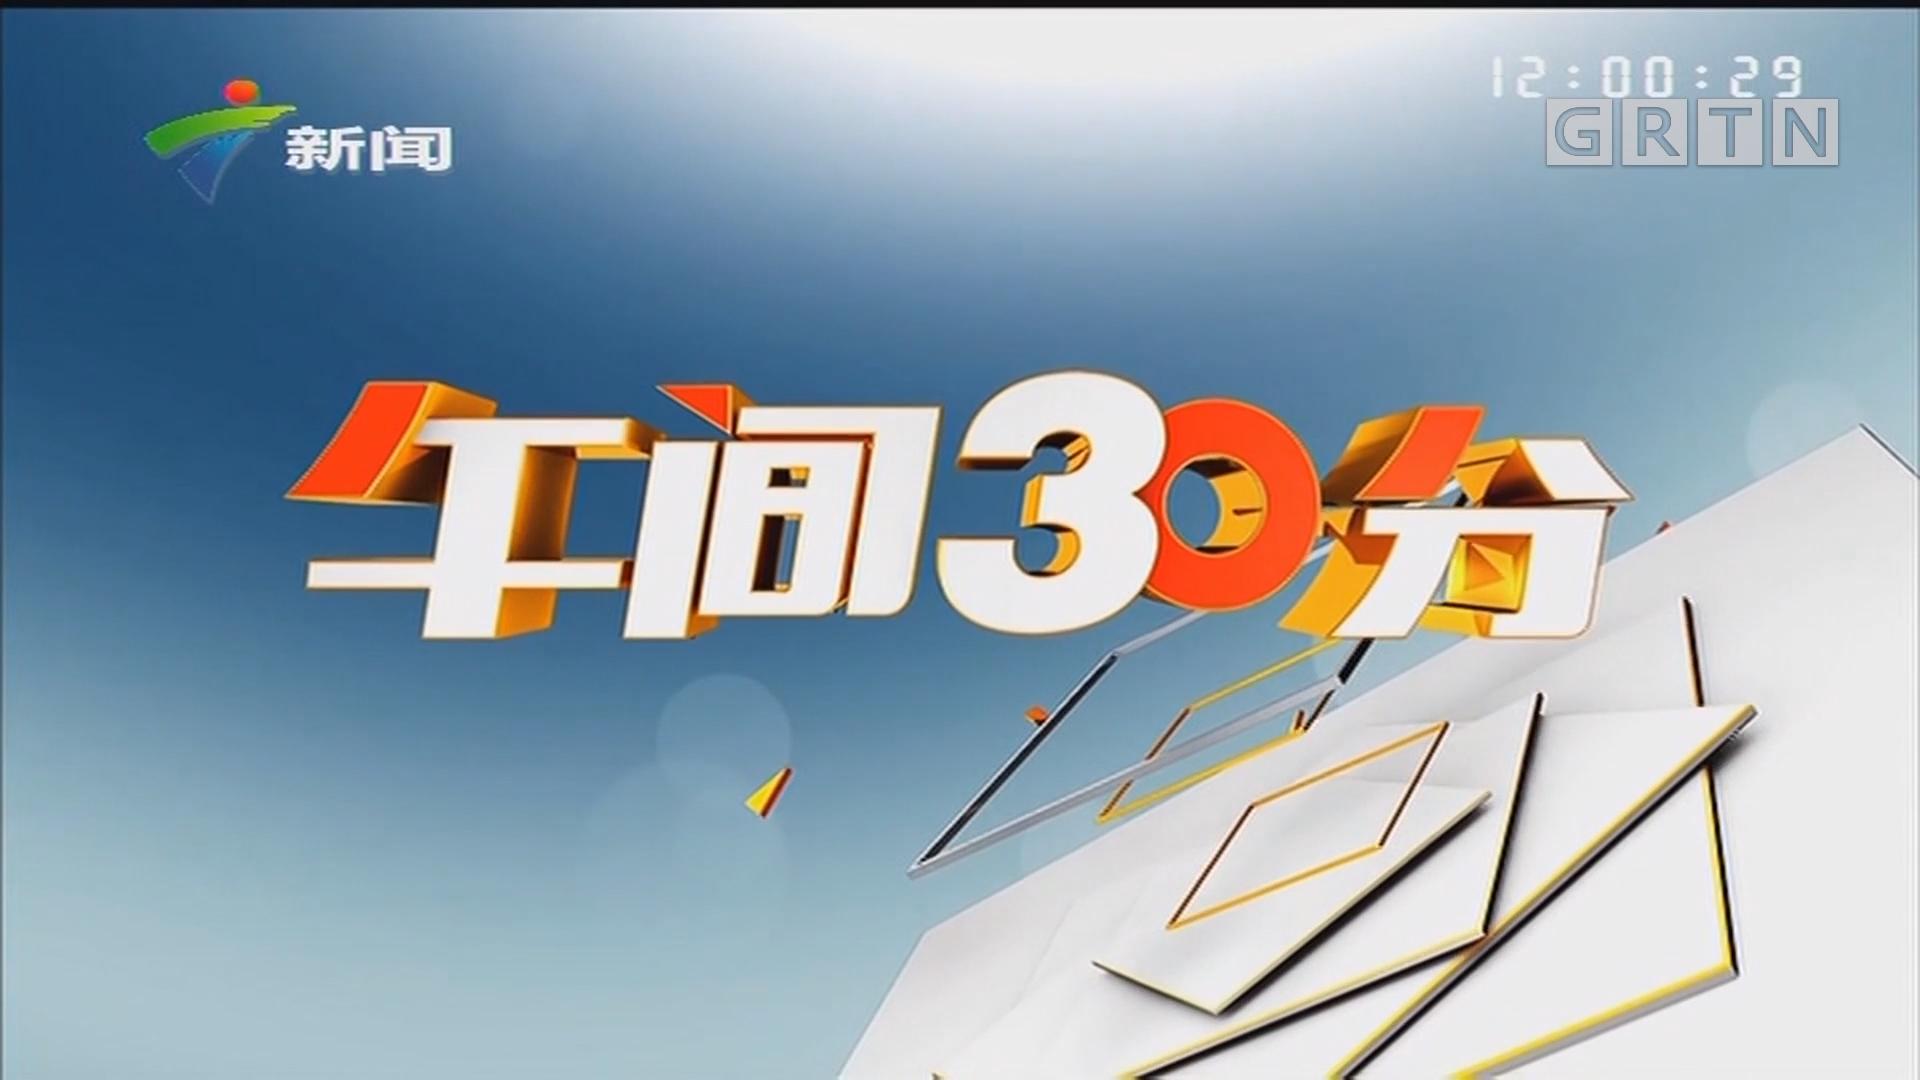 "[HD][2019-09-11]午间30分:公安部""购车上牌一站办结""等6项新措施公布:9月20日起推行6项交管新措施"